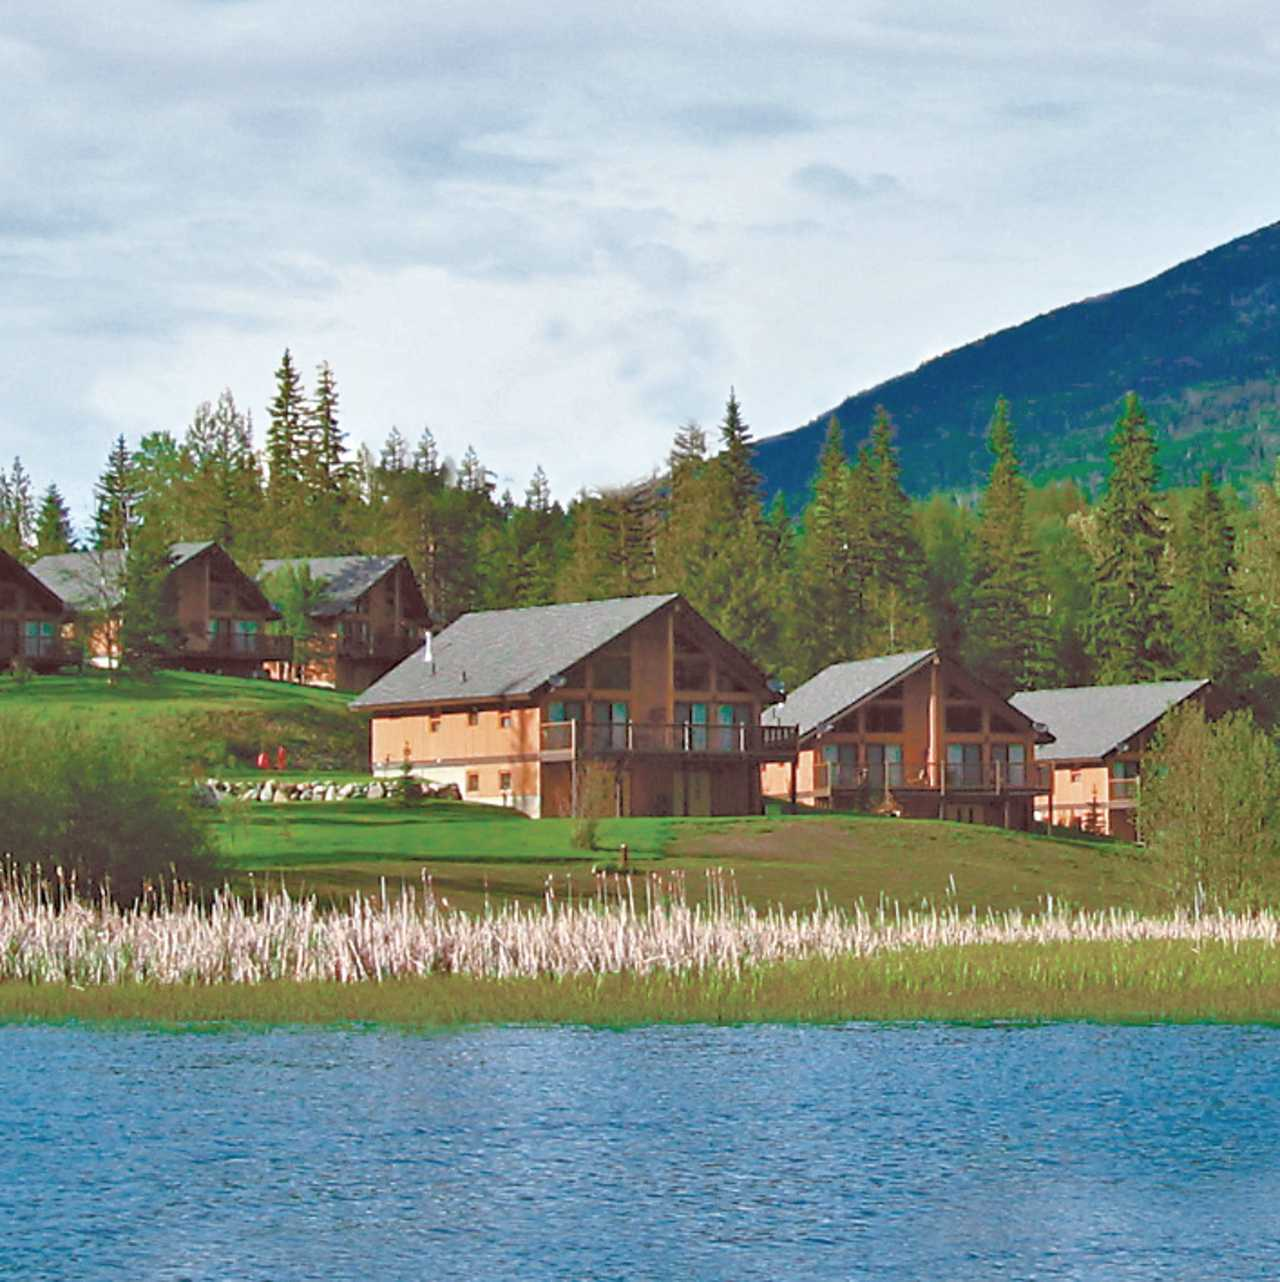 Hotel, British Columbia: Alpine Meadows Resort